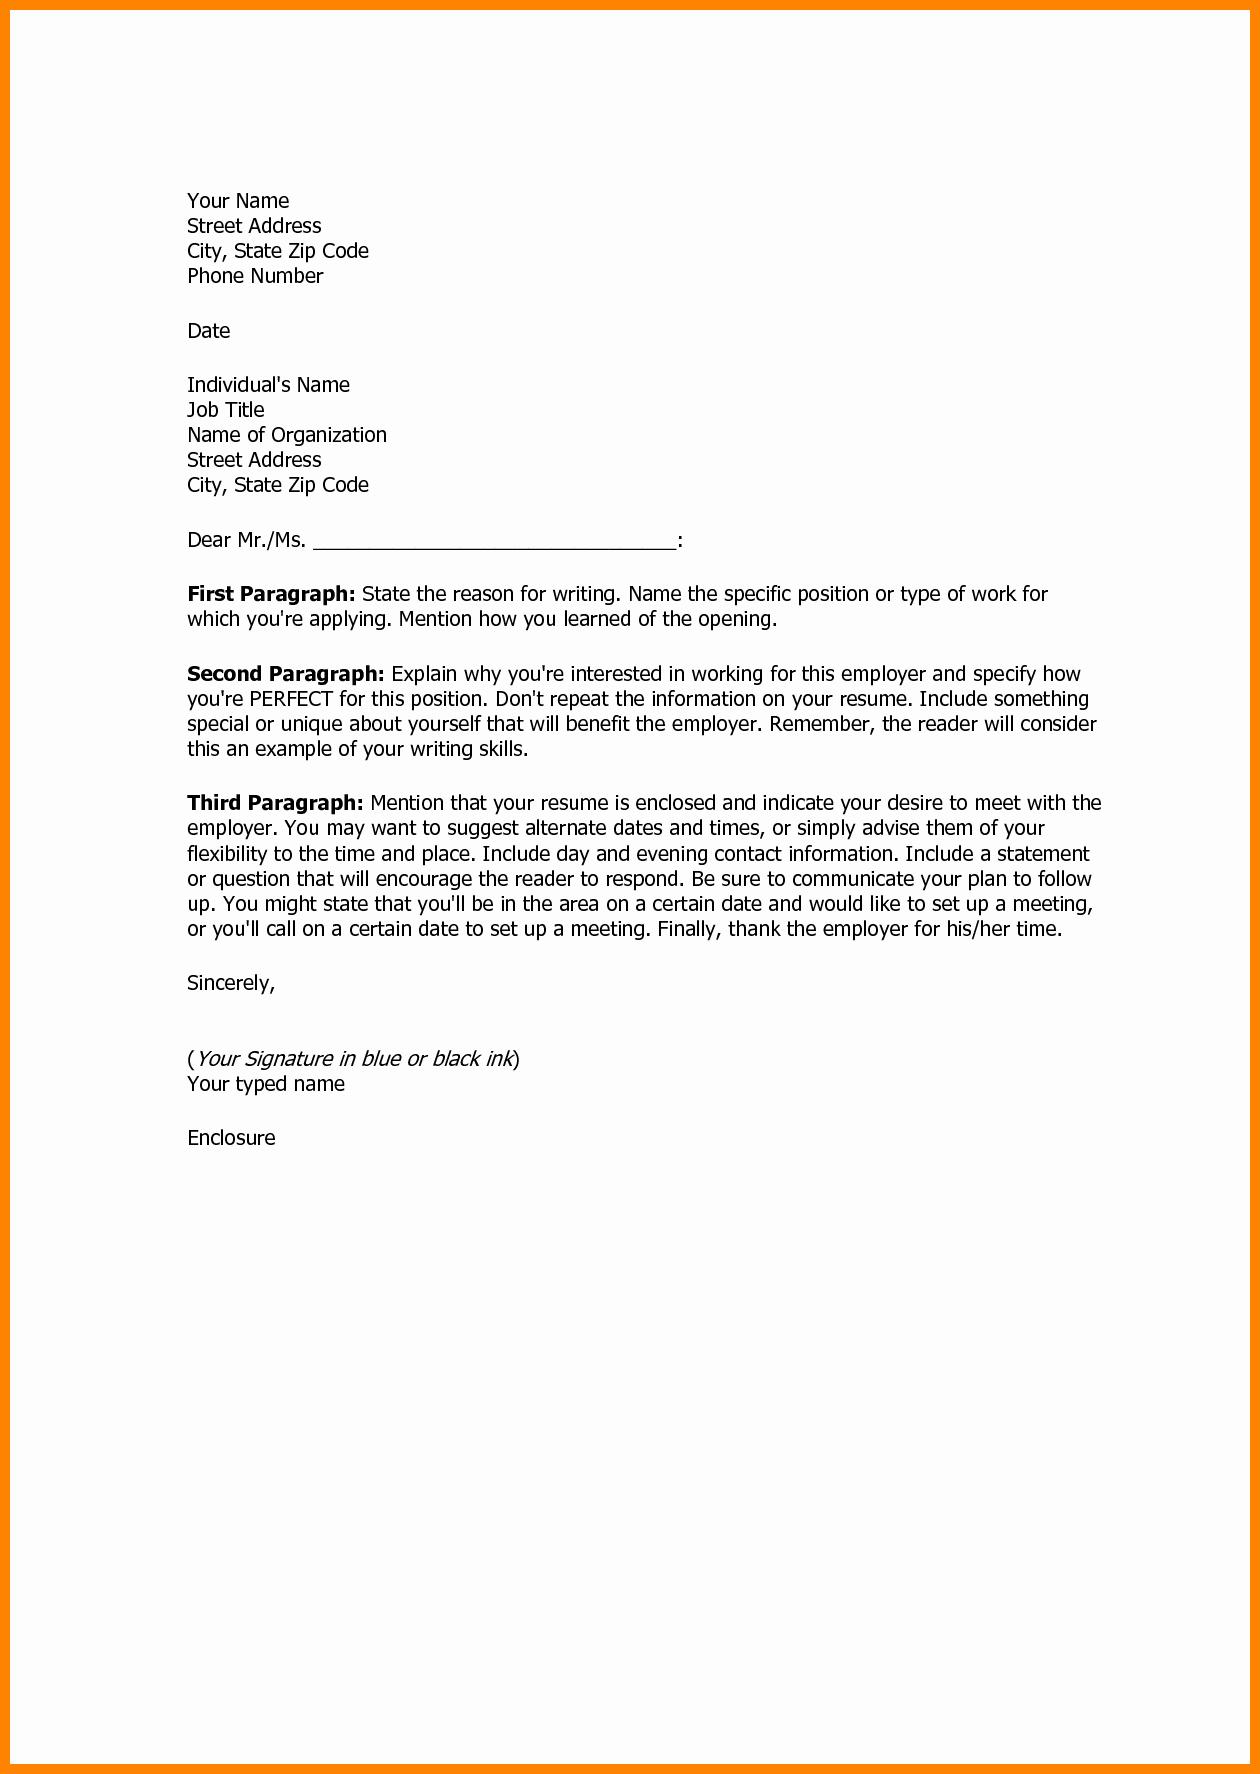 Simple Resume Cover Letter Template Best Of 17 Sample Basic Cover Letter